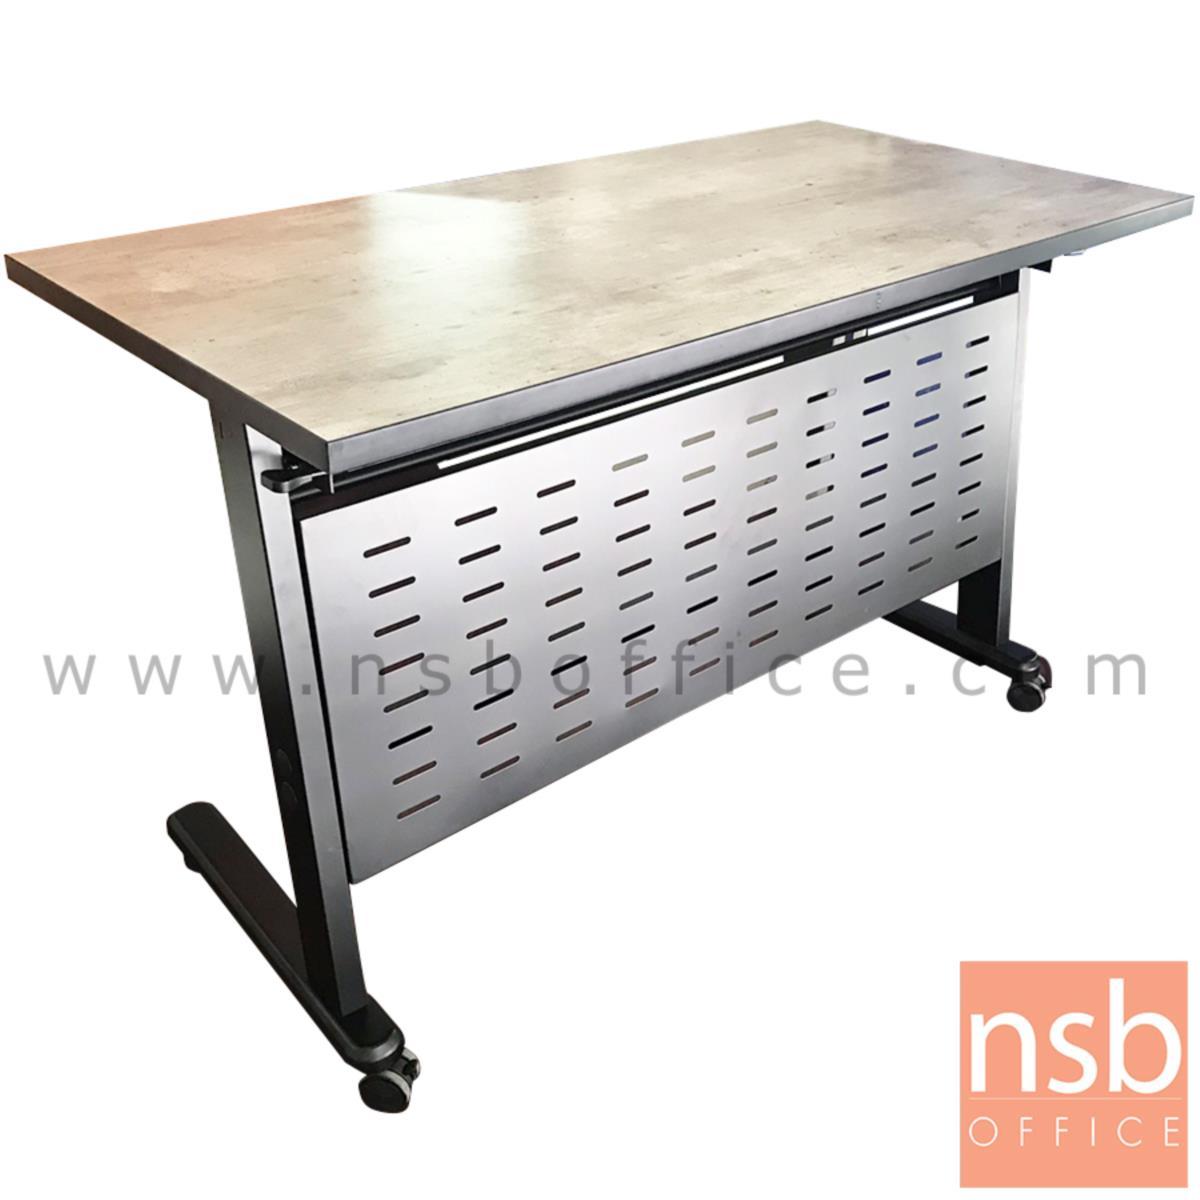 A18A093:โต๊ะพับล้อเลื่อน 120W*60D cm CN-026  พร้อมบังตาเหล็กและที่วางของด้านใต้